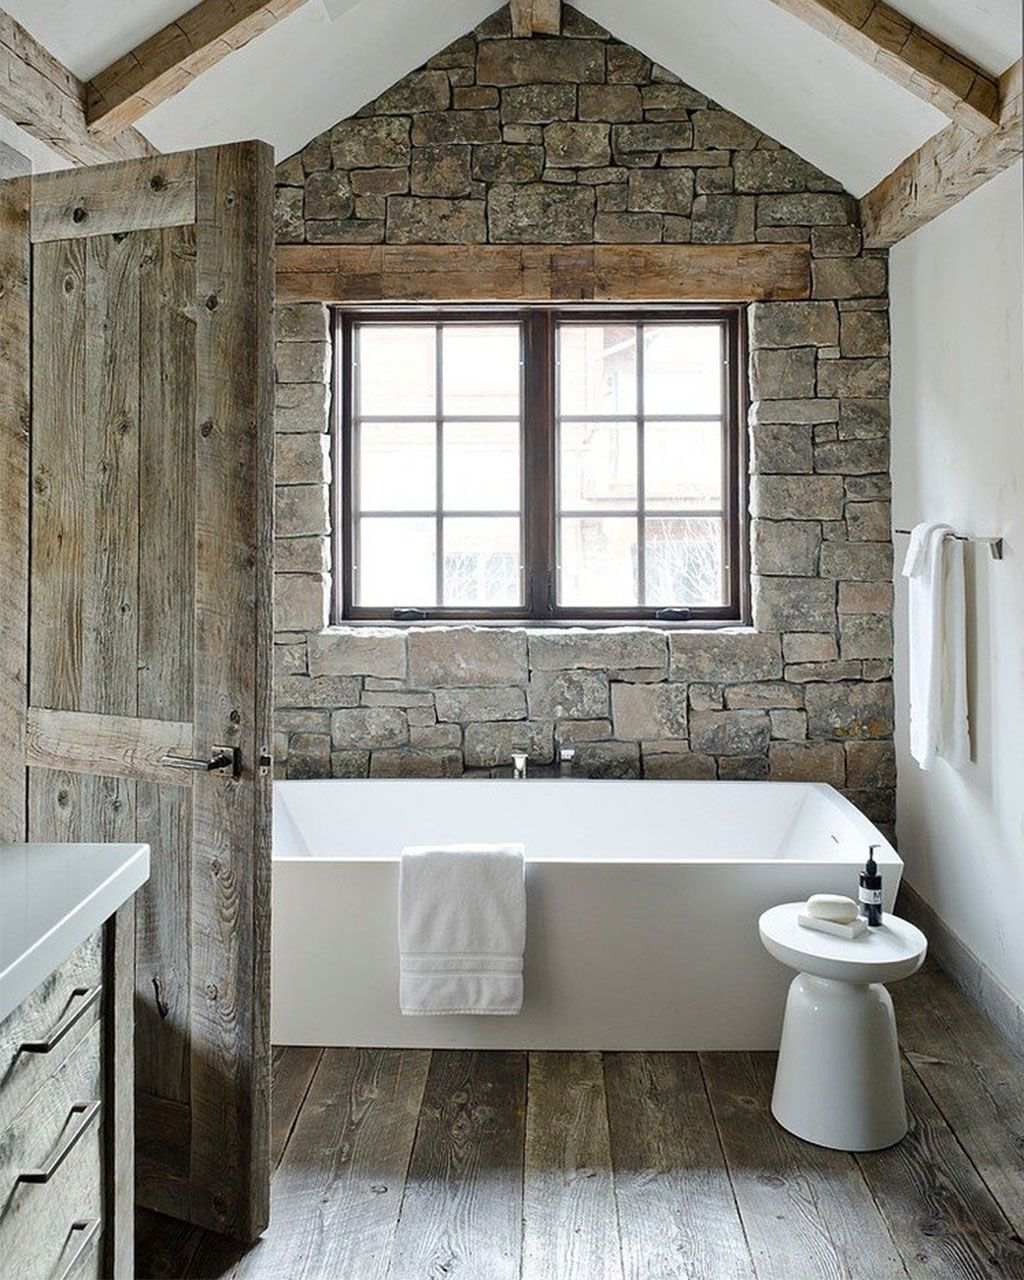 Modern Rustic Home Design Image Ideastodecor Rustic Bathroom